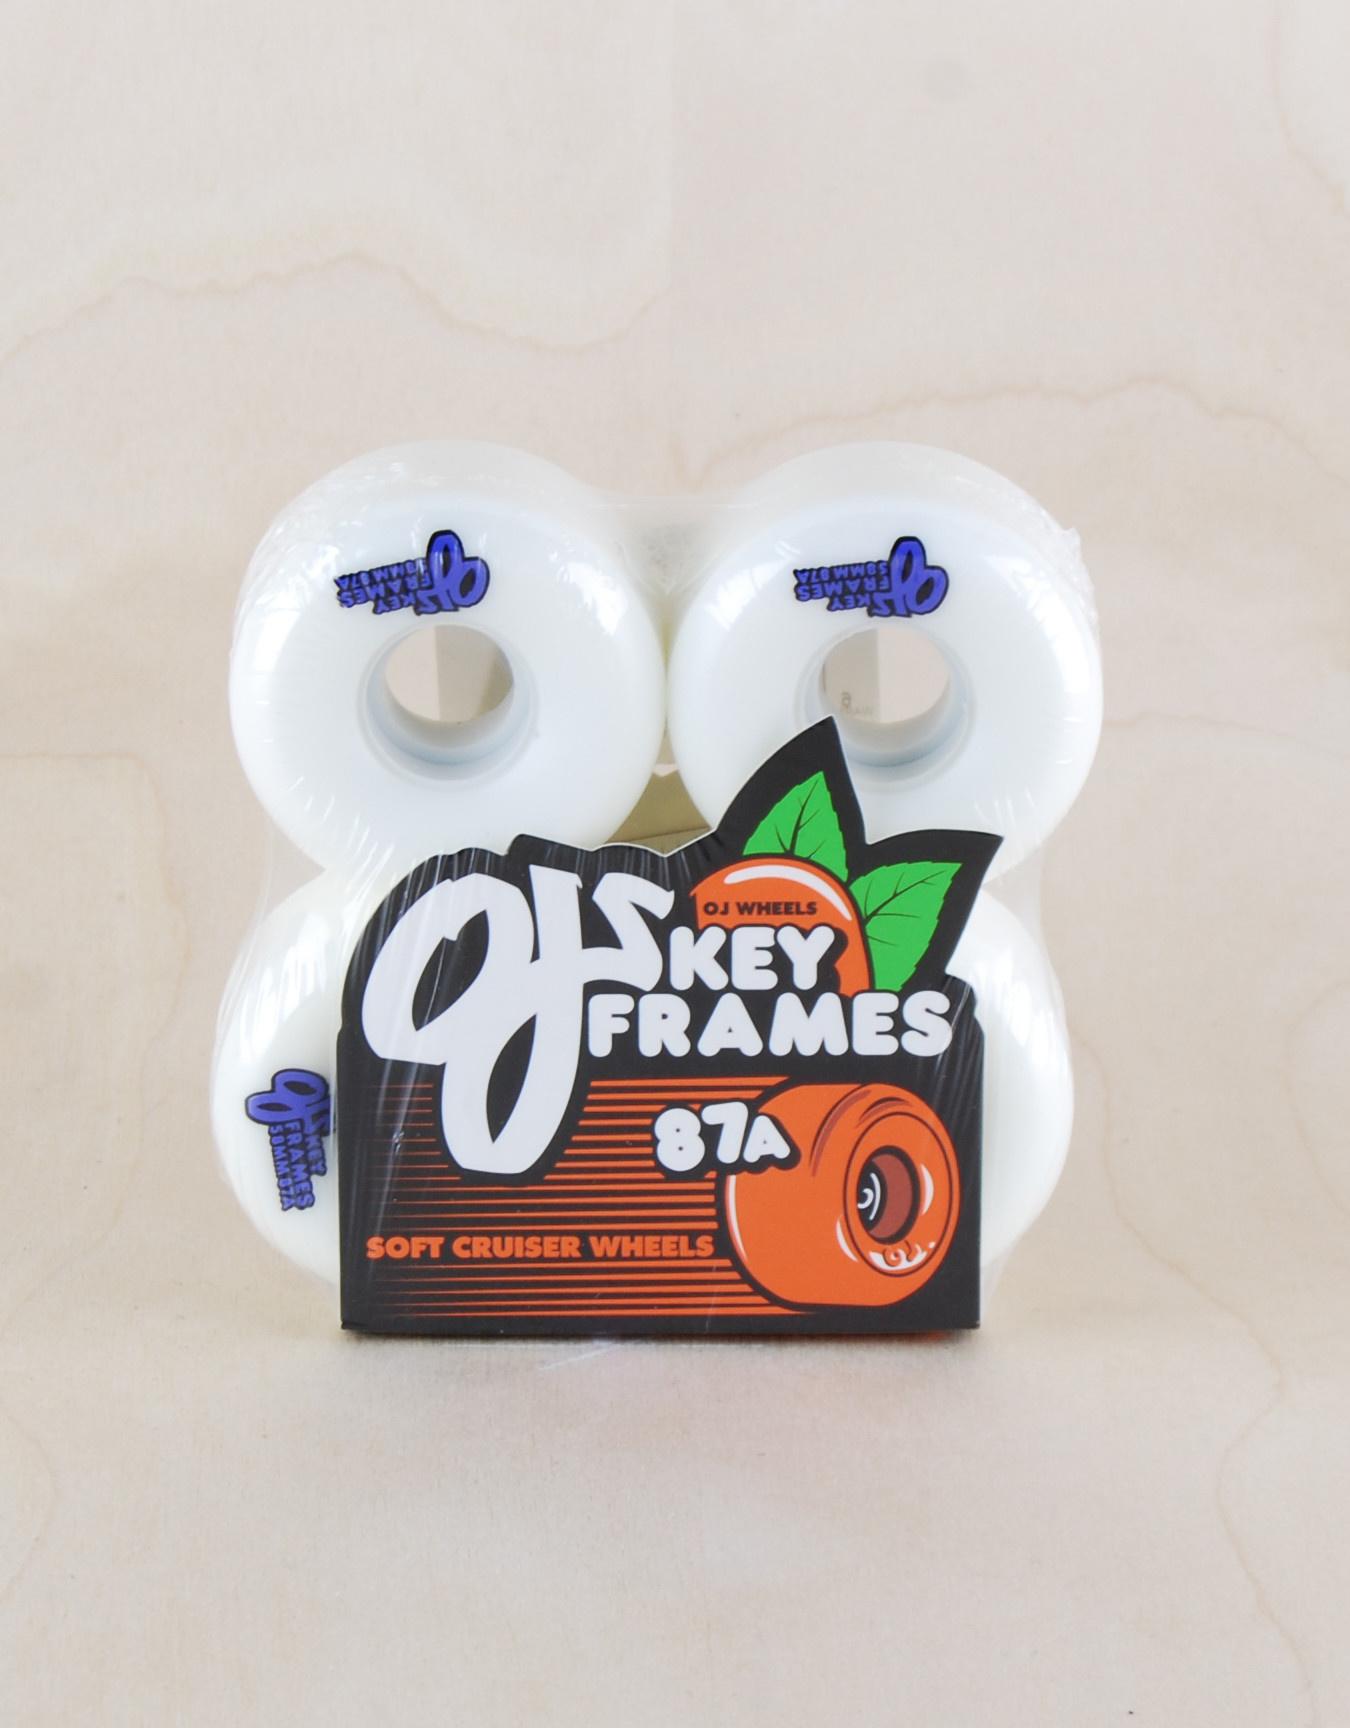 OJ OJ - Plain Jane Keyframe 87a